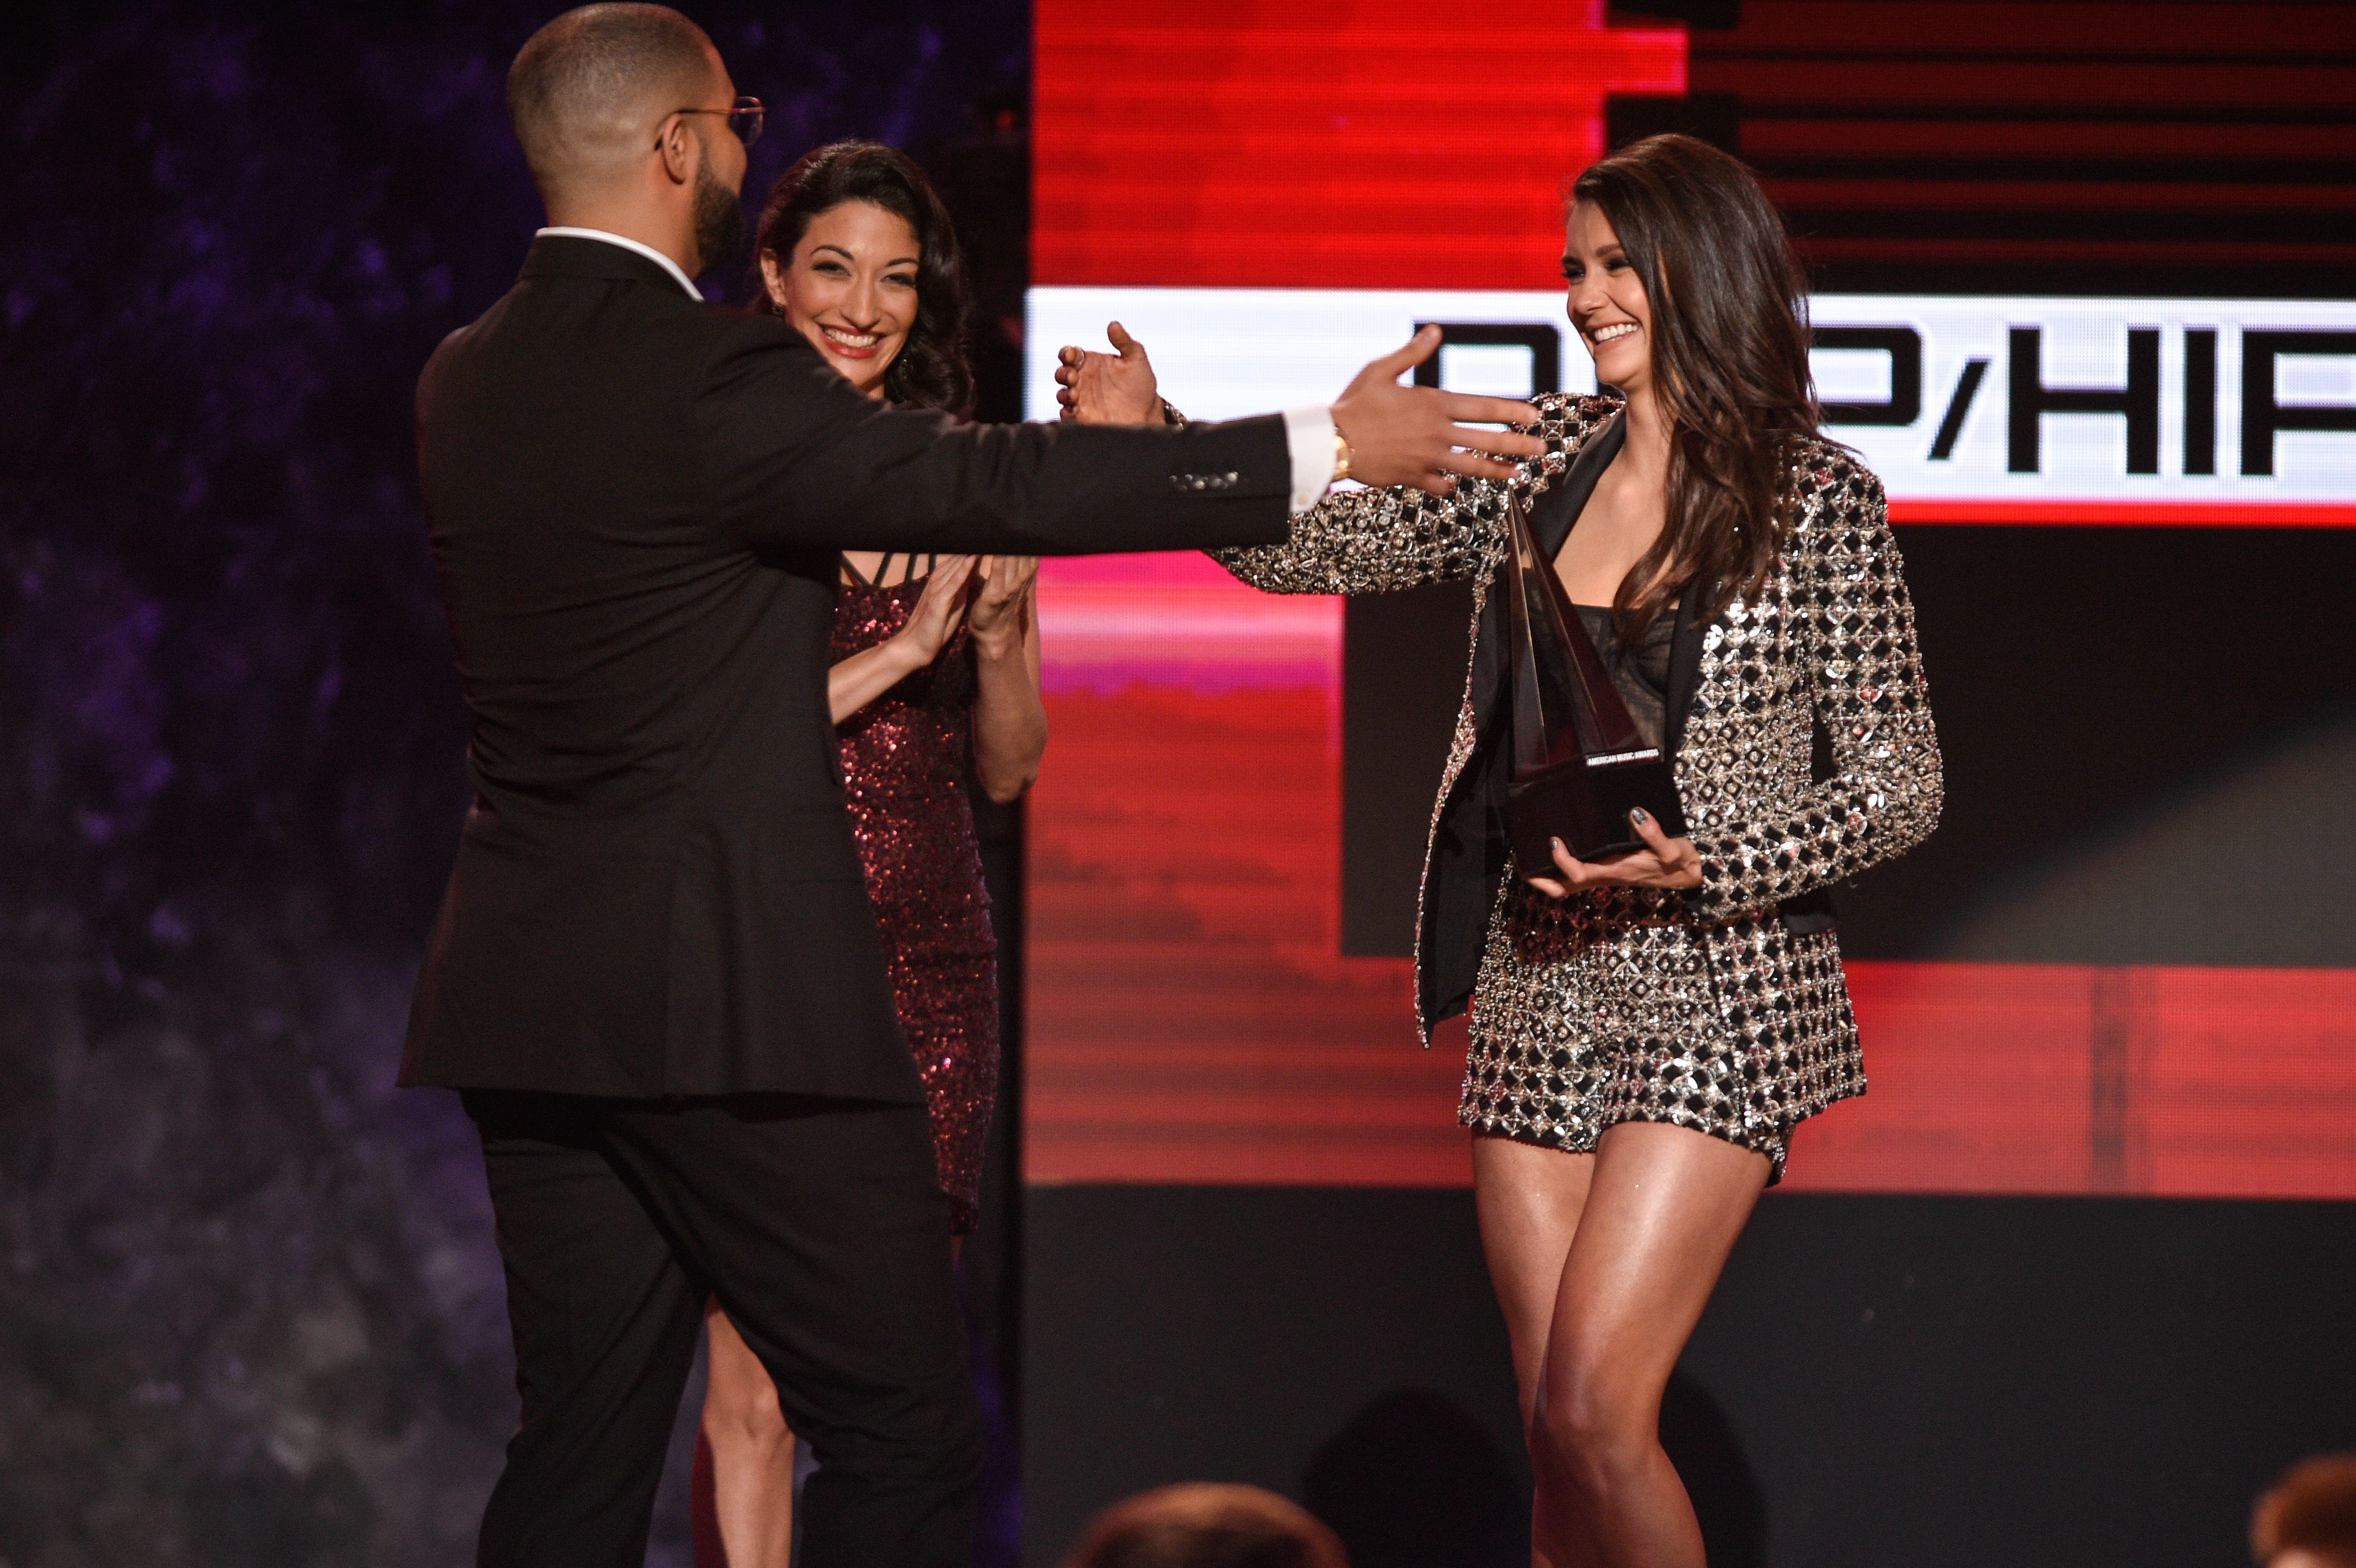 Nina Dobrev presents Drake with an awards at the American Music Awards in Los Angeles on Nov. 20, 2016.